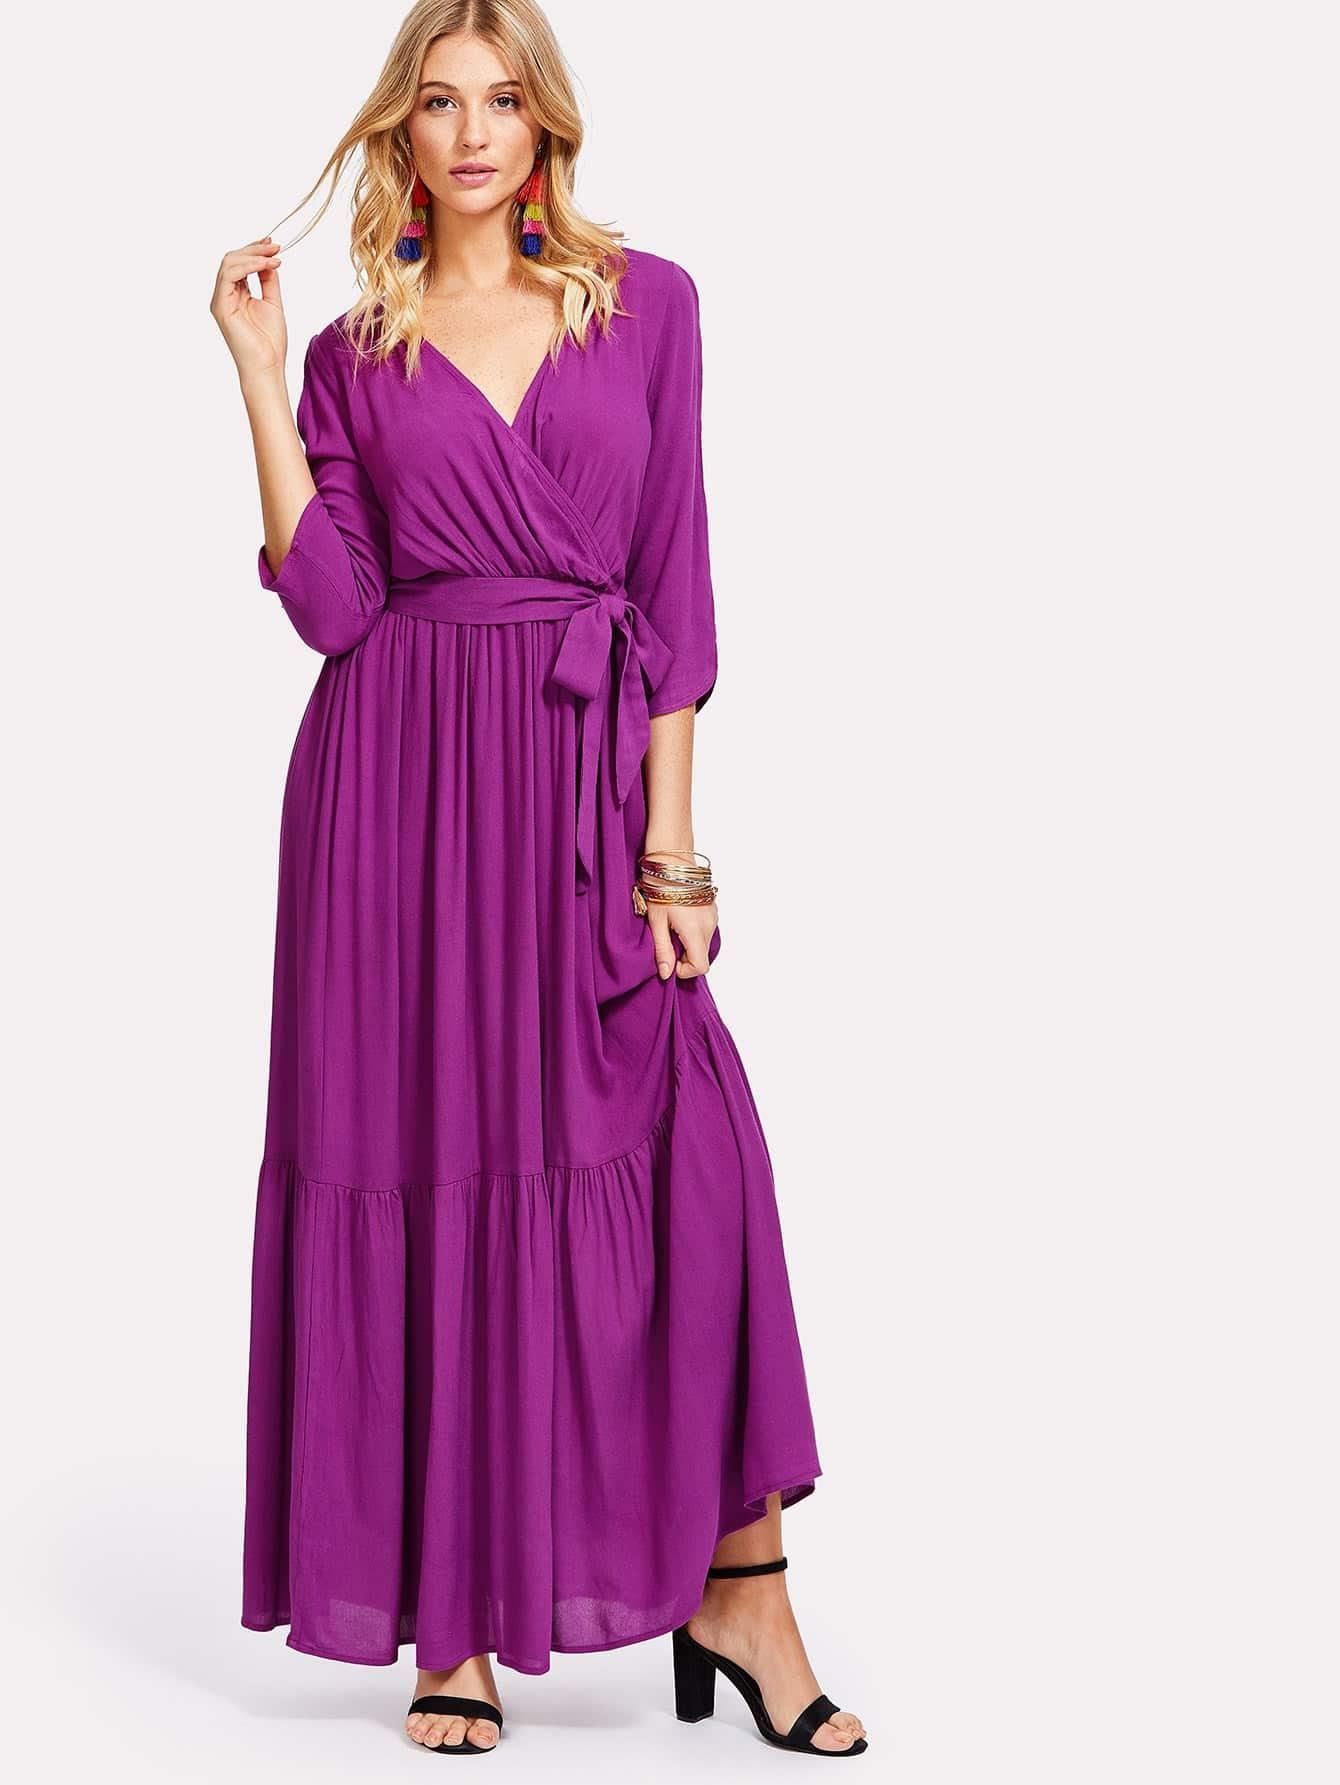 Self Belted Surplice Wrap Dress surplice neck self belted floral dress